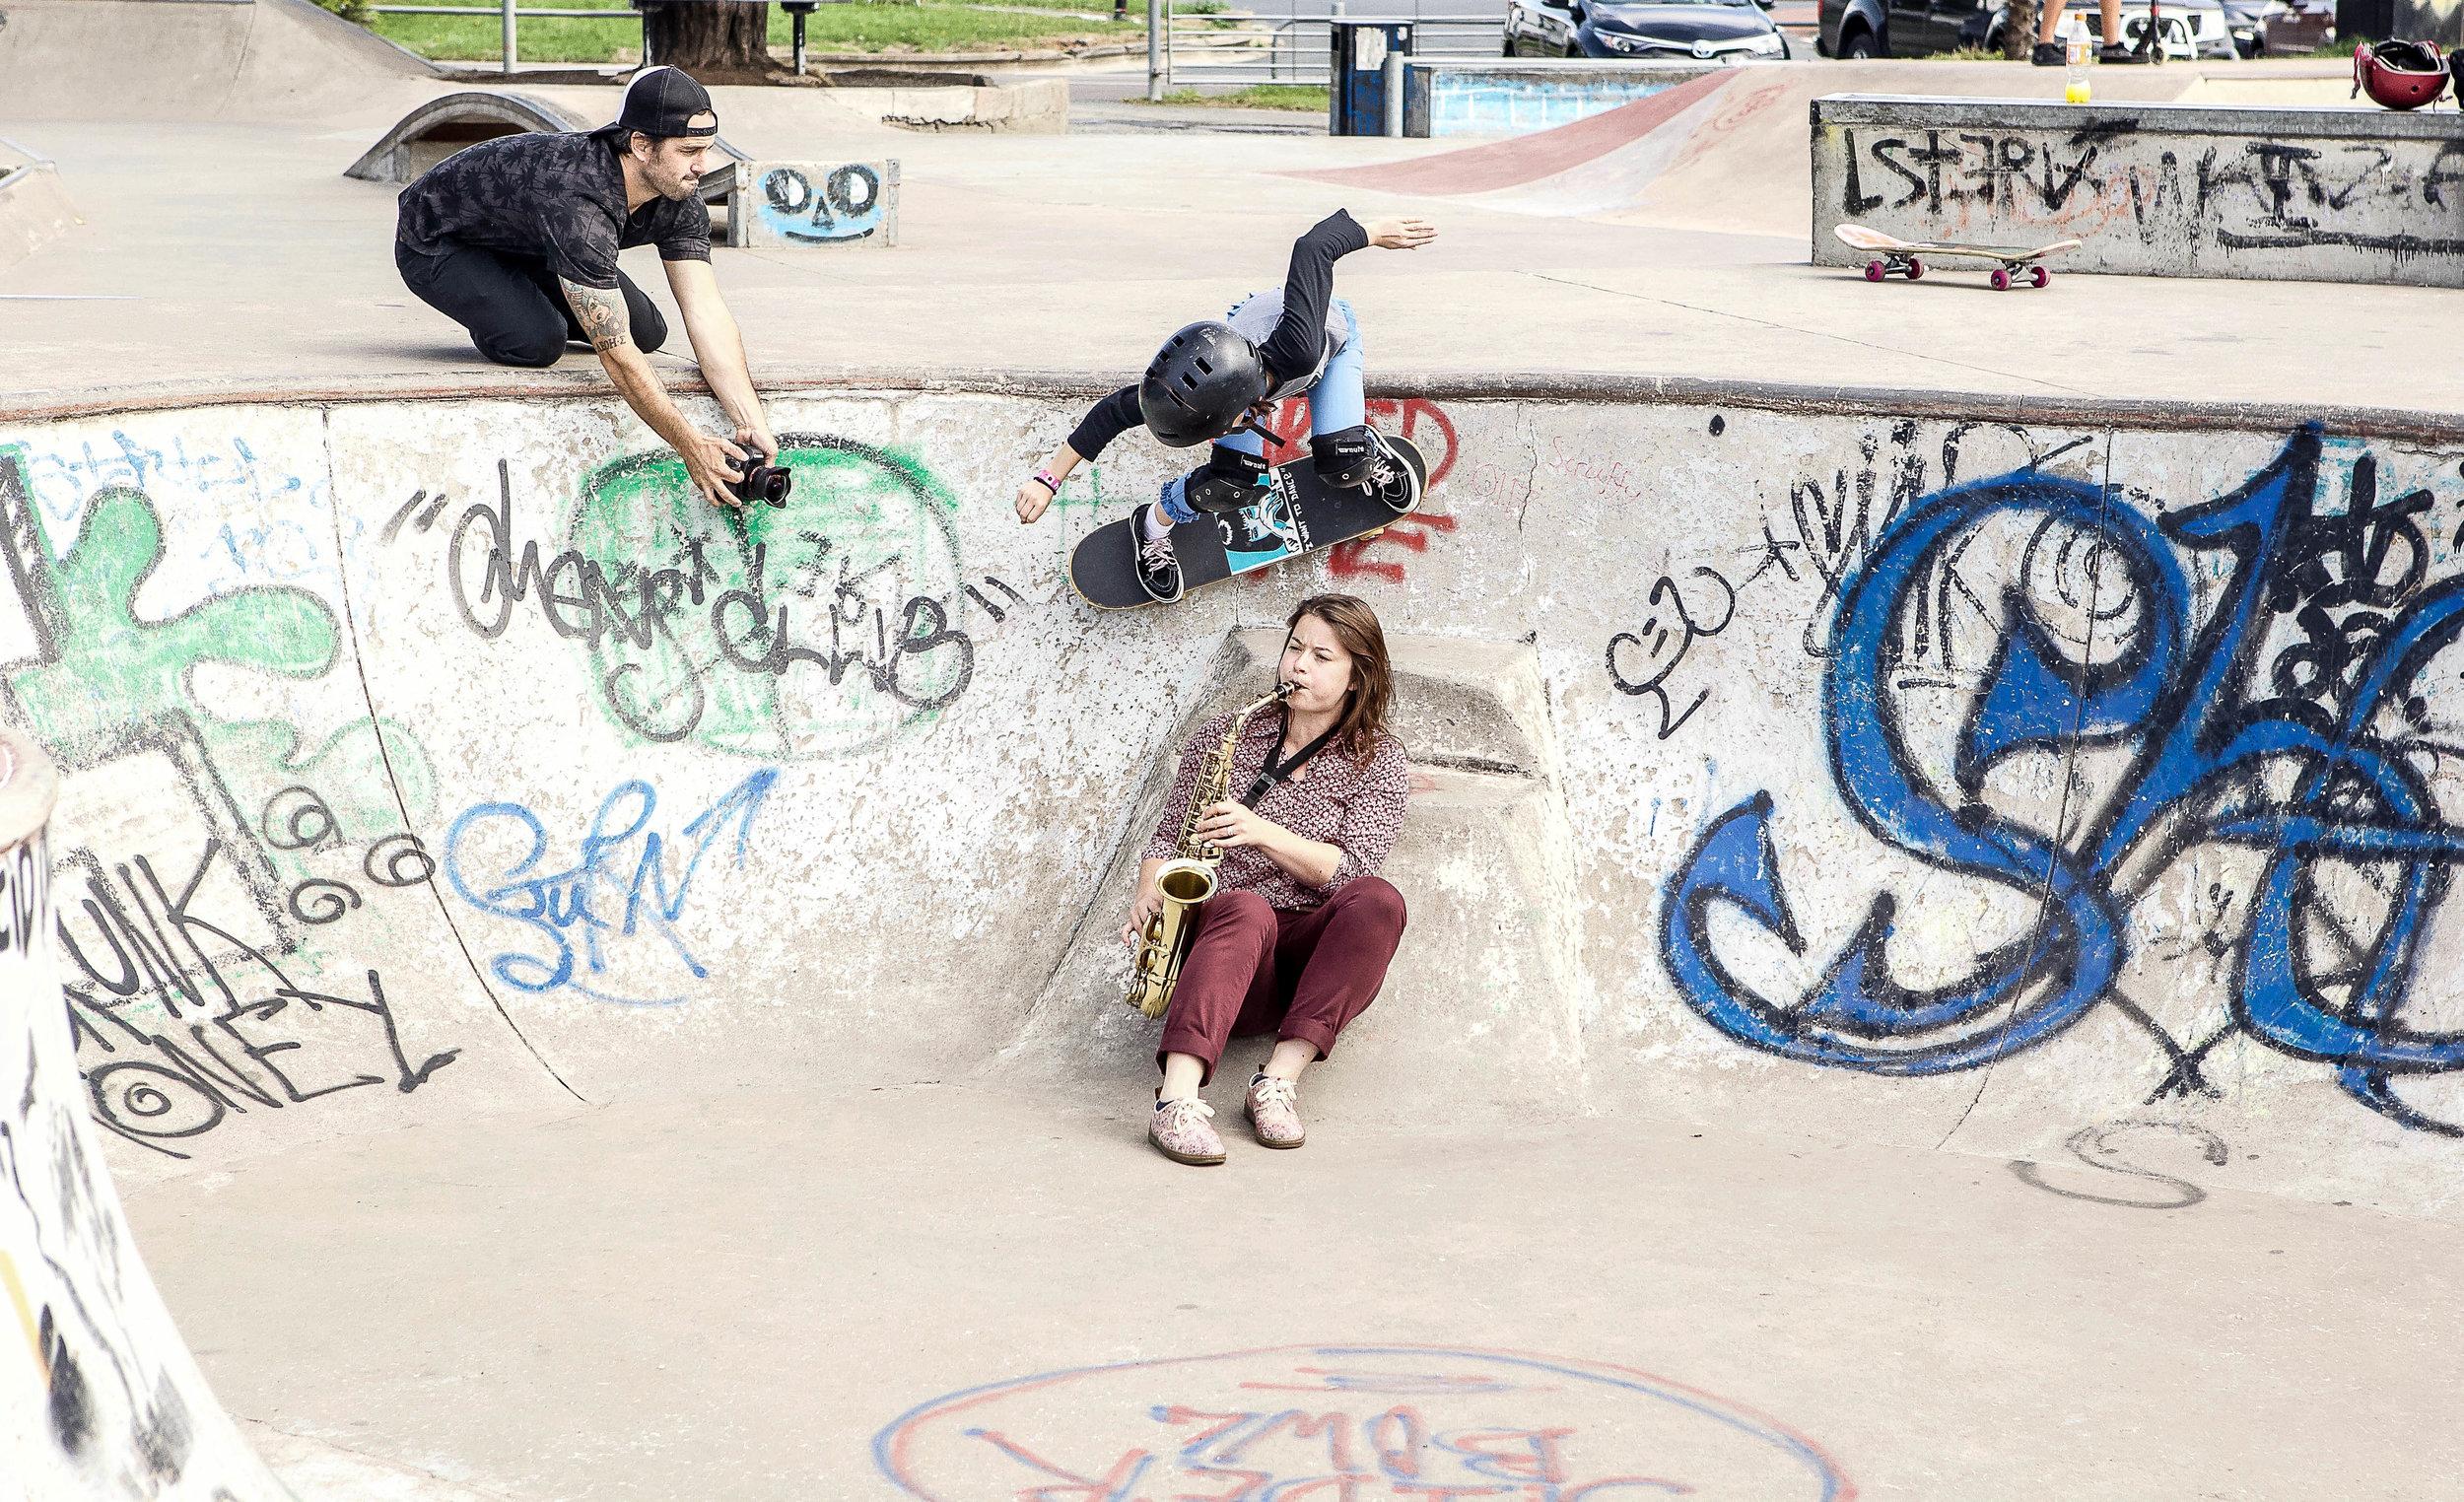 concretegirls-comp-7793.jpg